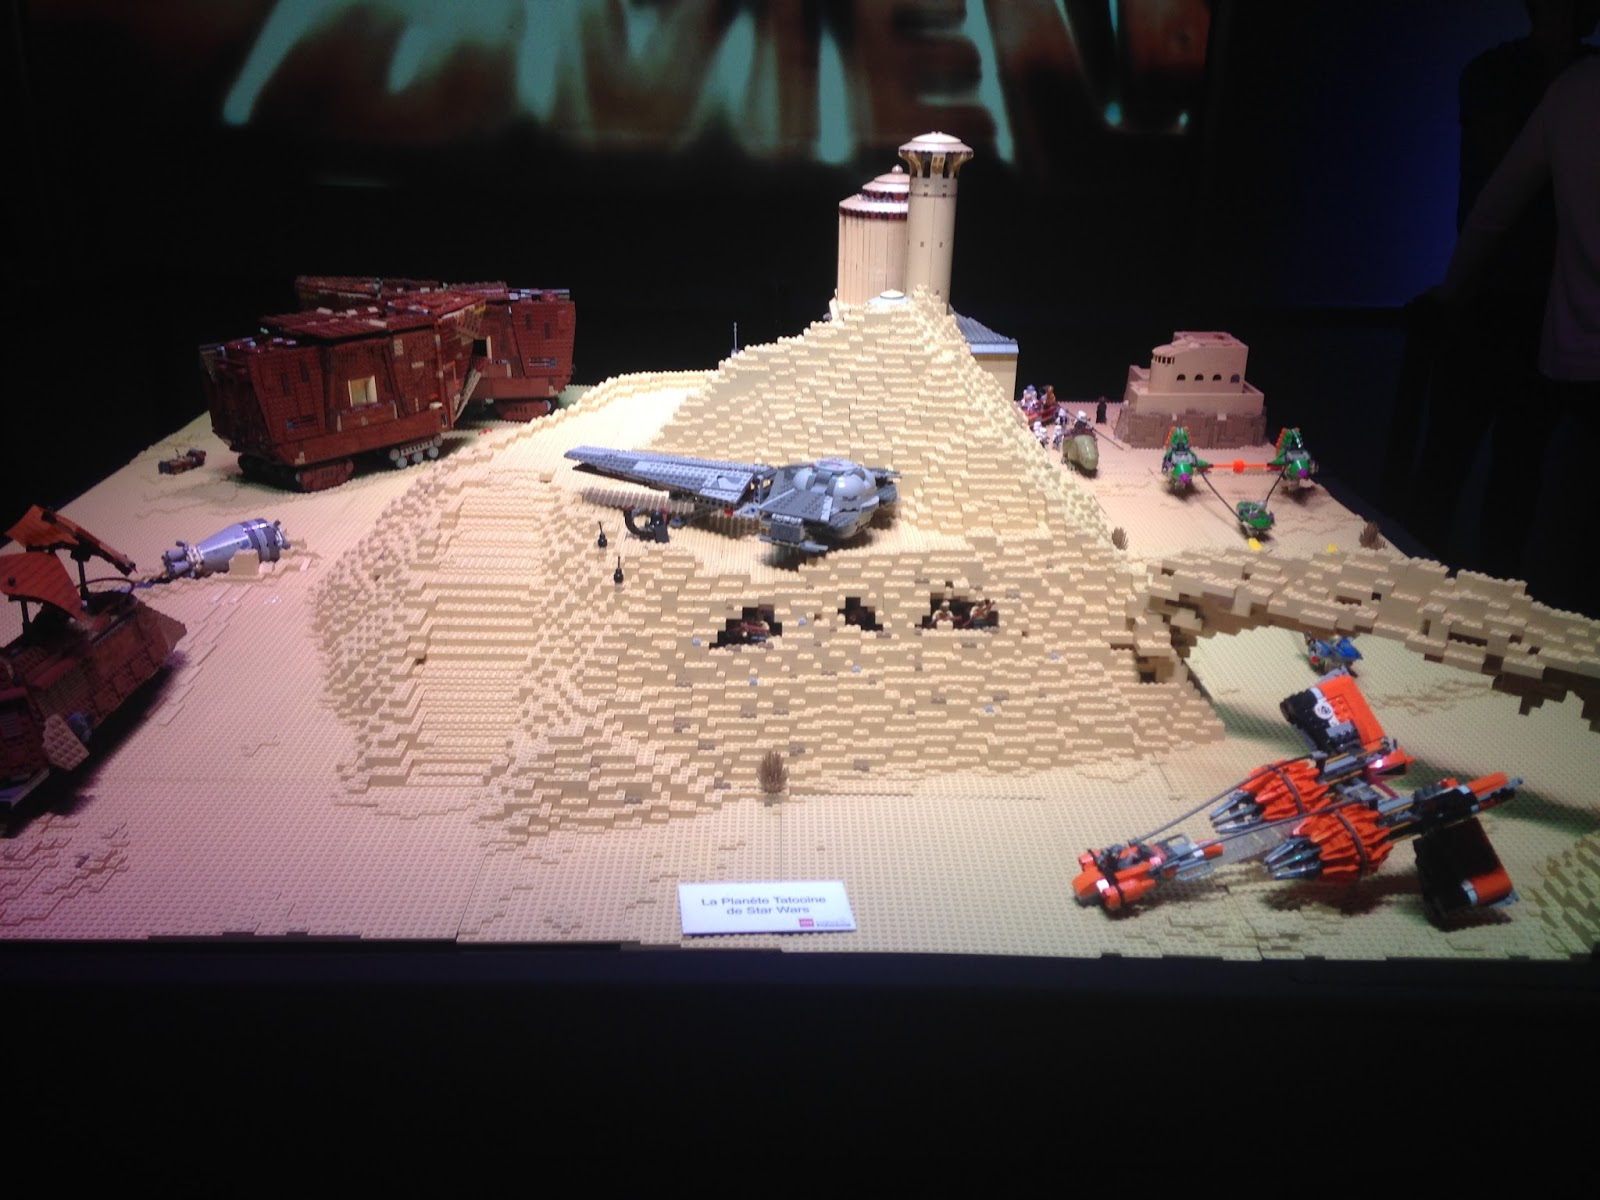 Lego Star Wars, la planète Tatooine